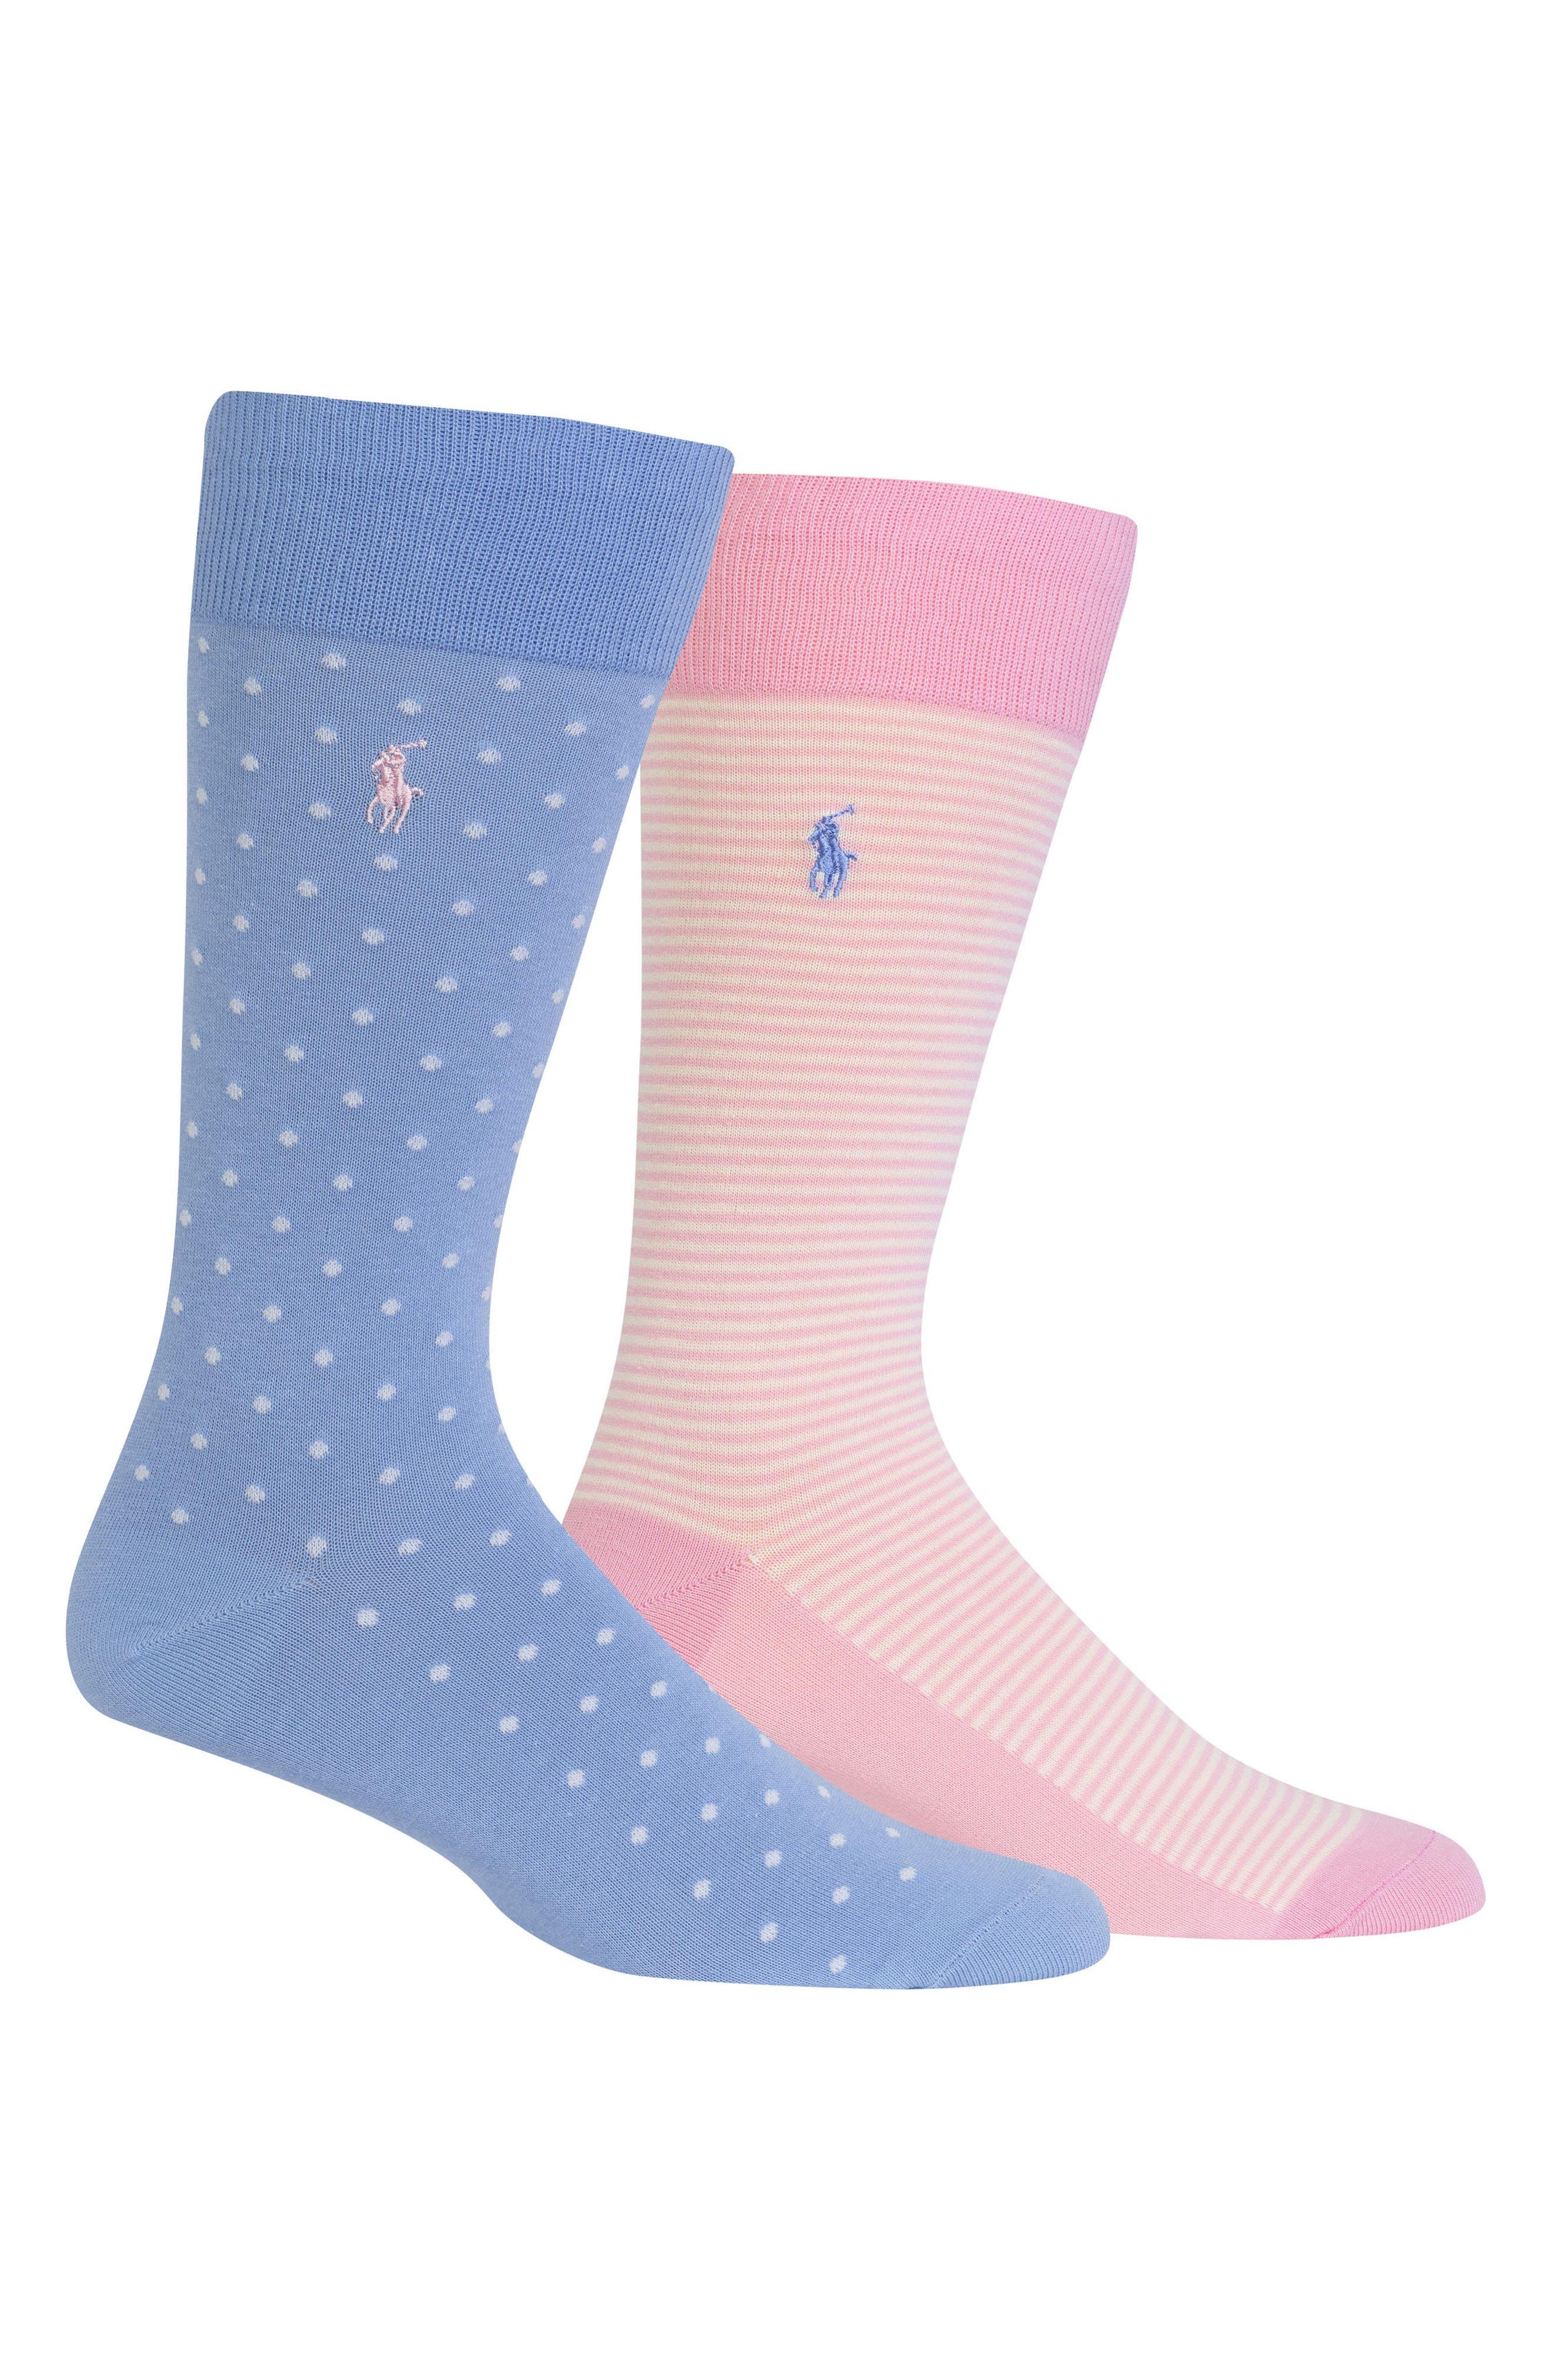 2-Pack Socks,                             Main thumbnail 1, color,                             Light Blue